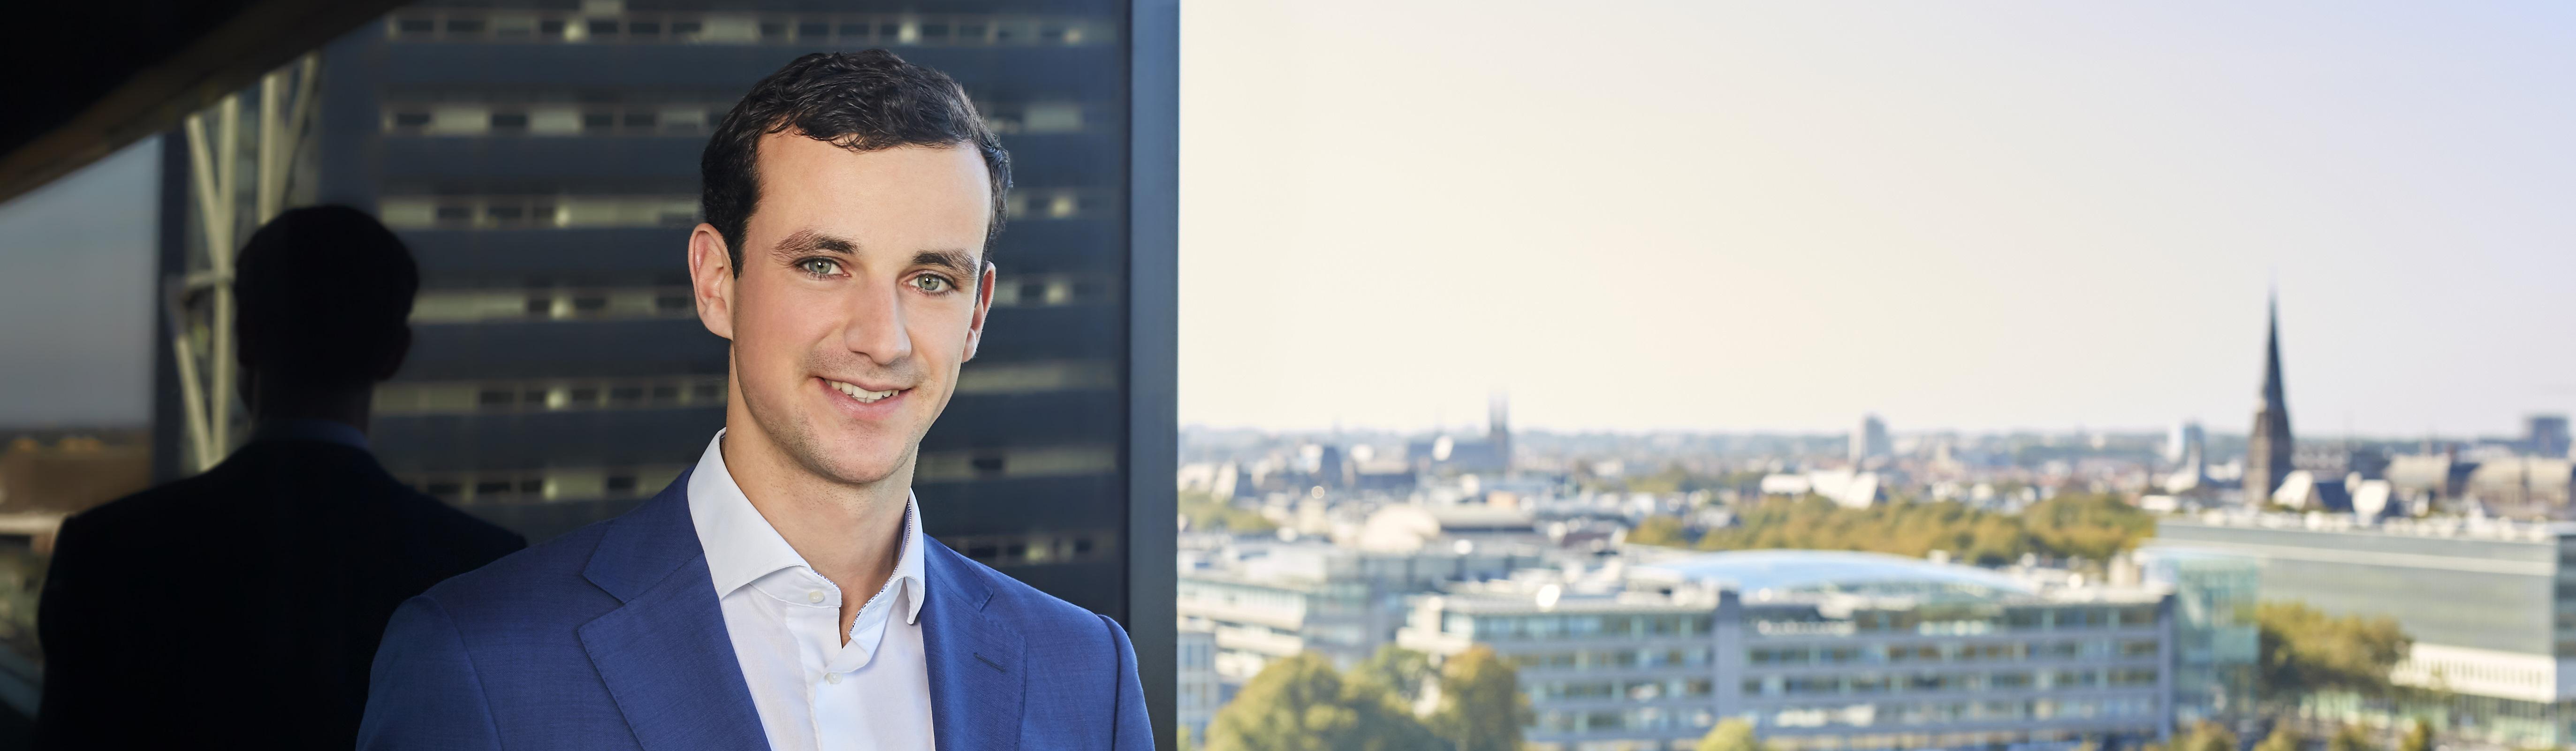 Benjamin Gideonse, advocaat Pels Rijcken